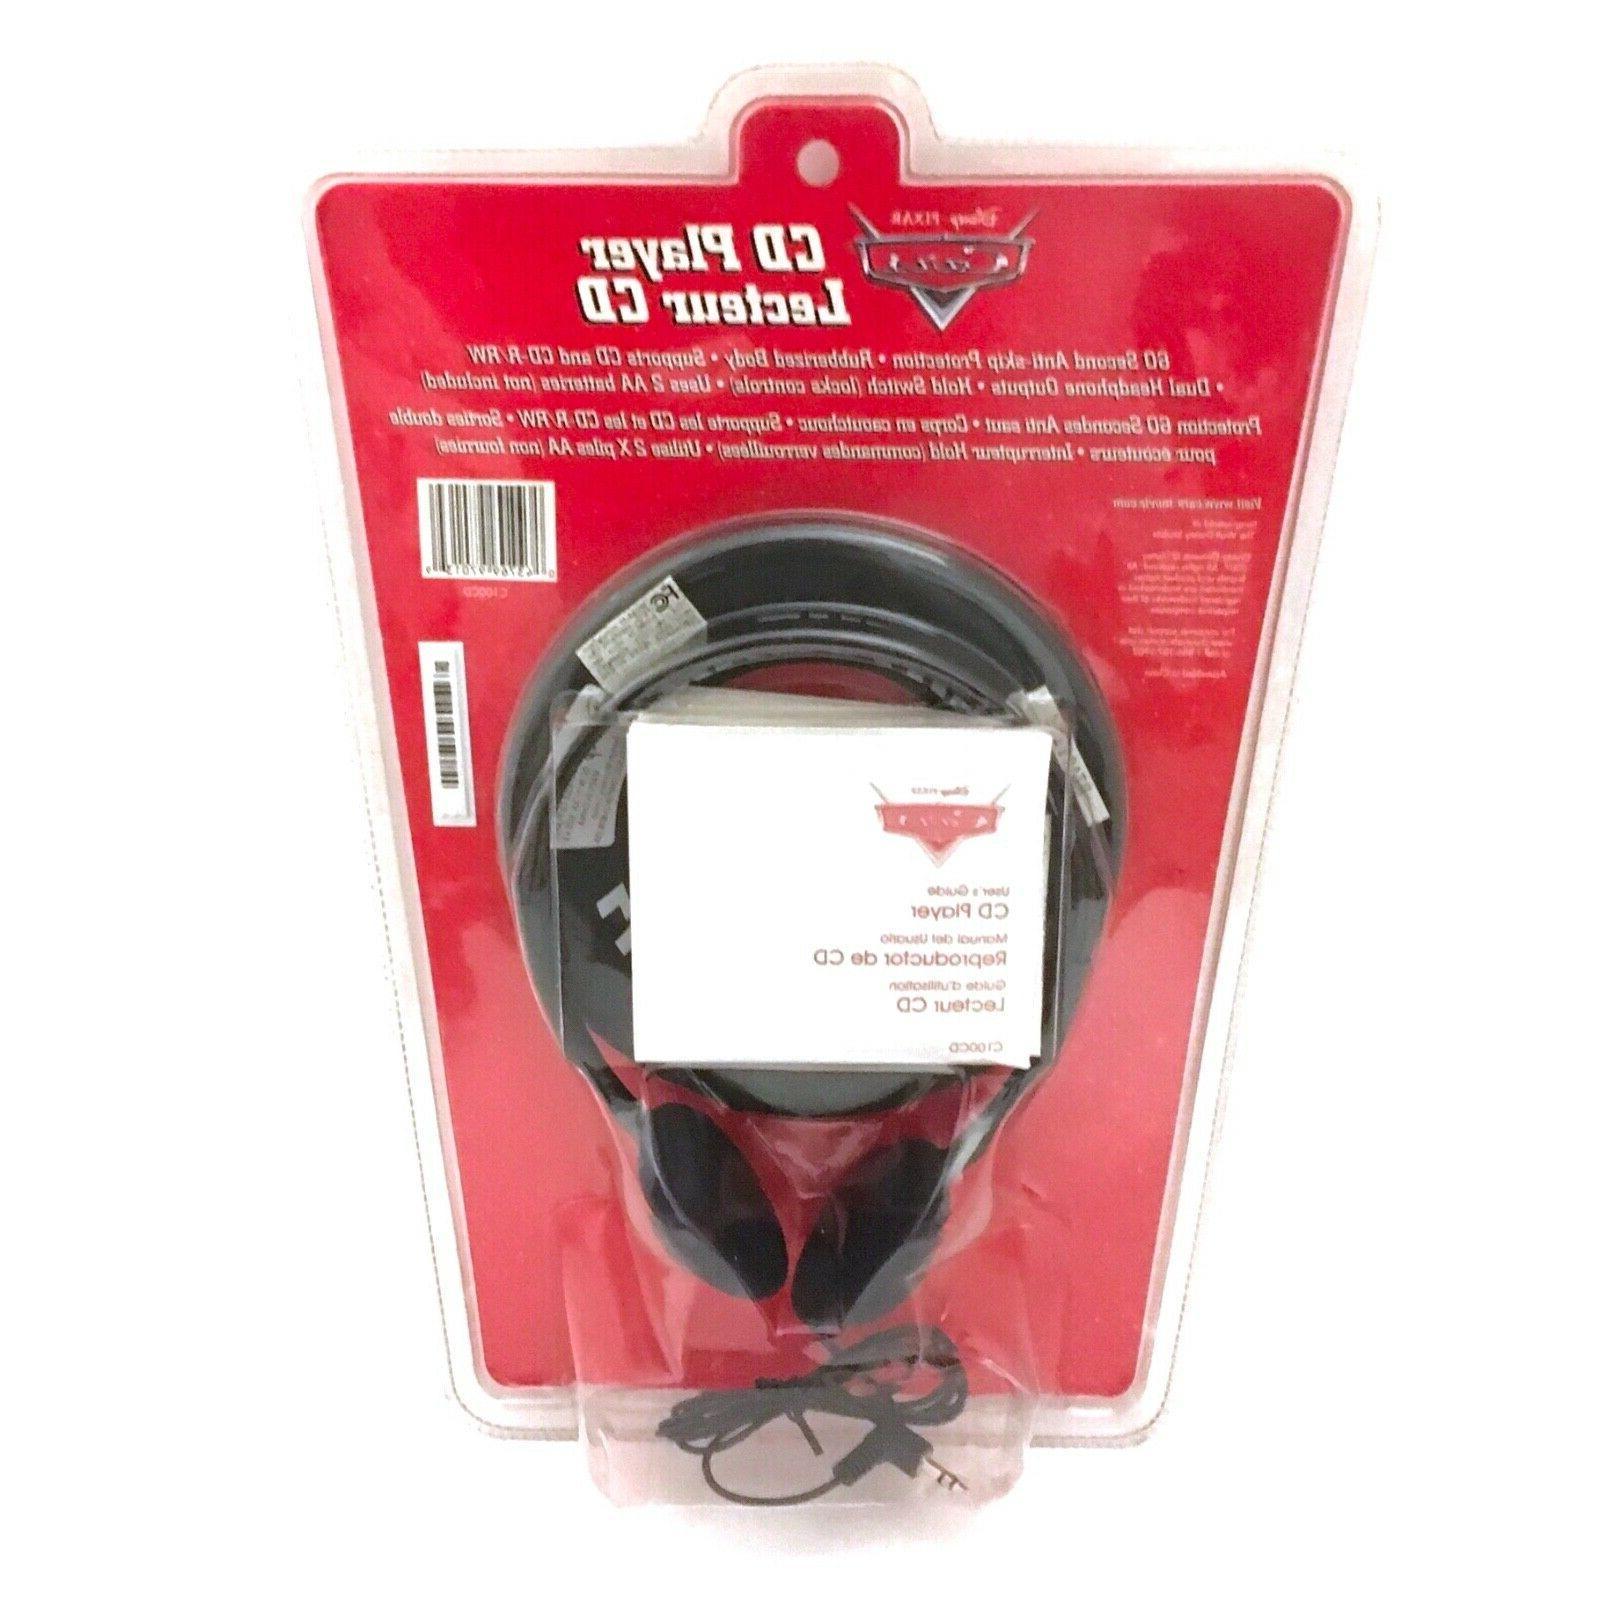 Disney Lightning Mcqueen Portable CD Player in Black